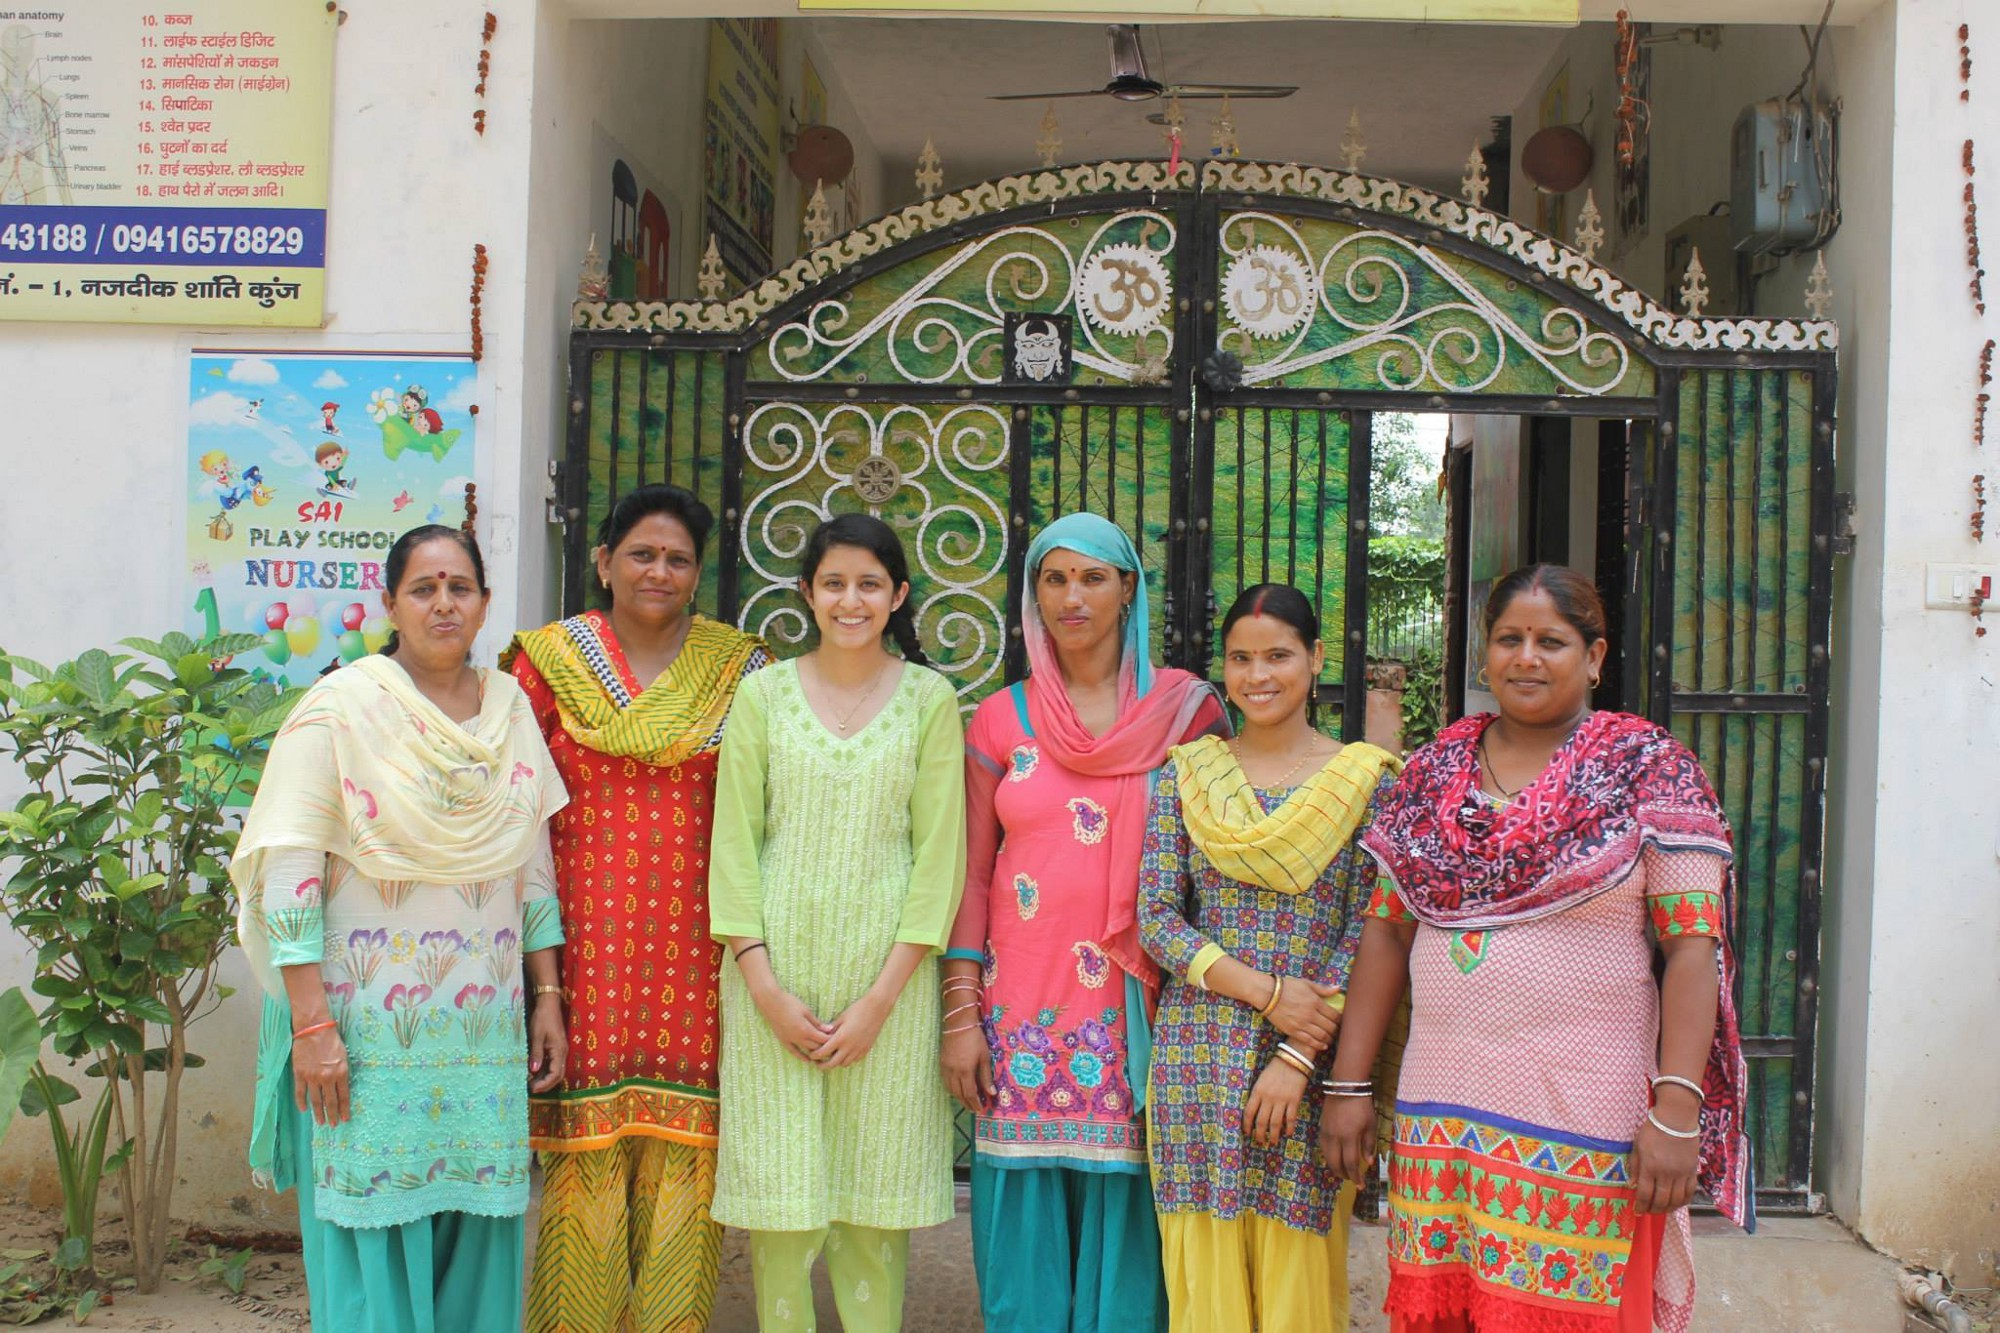 Prabha Dublish | Womentum